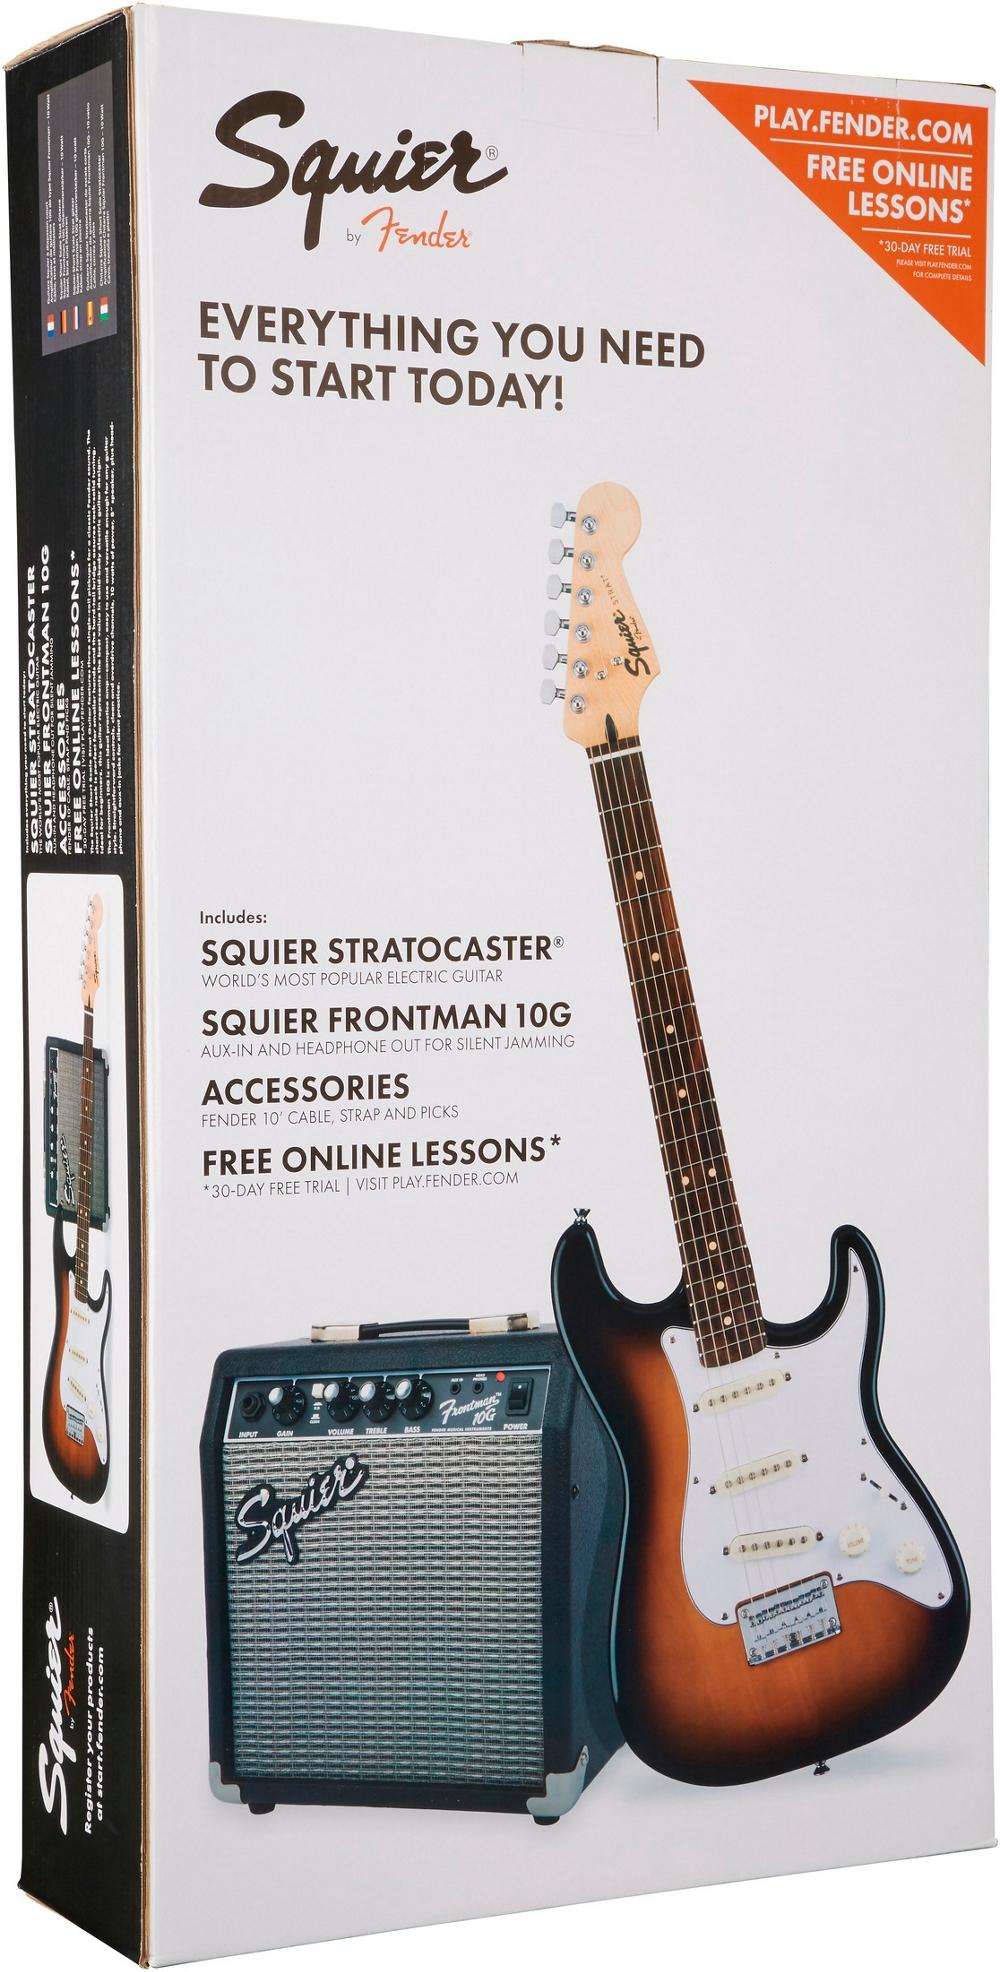 squier strat pack sss electric guitar w fender frontman 10g combo amp brown sb ebay. Black Bedroom Furniture Sets. Home Design Ideas